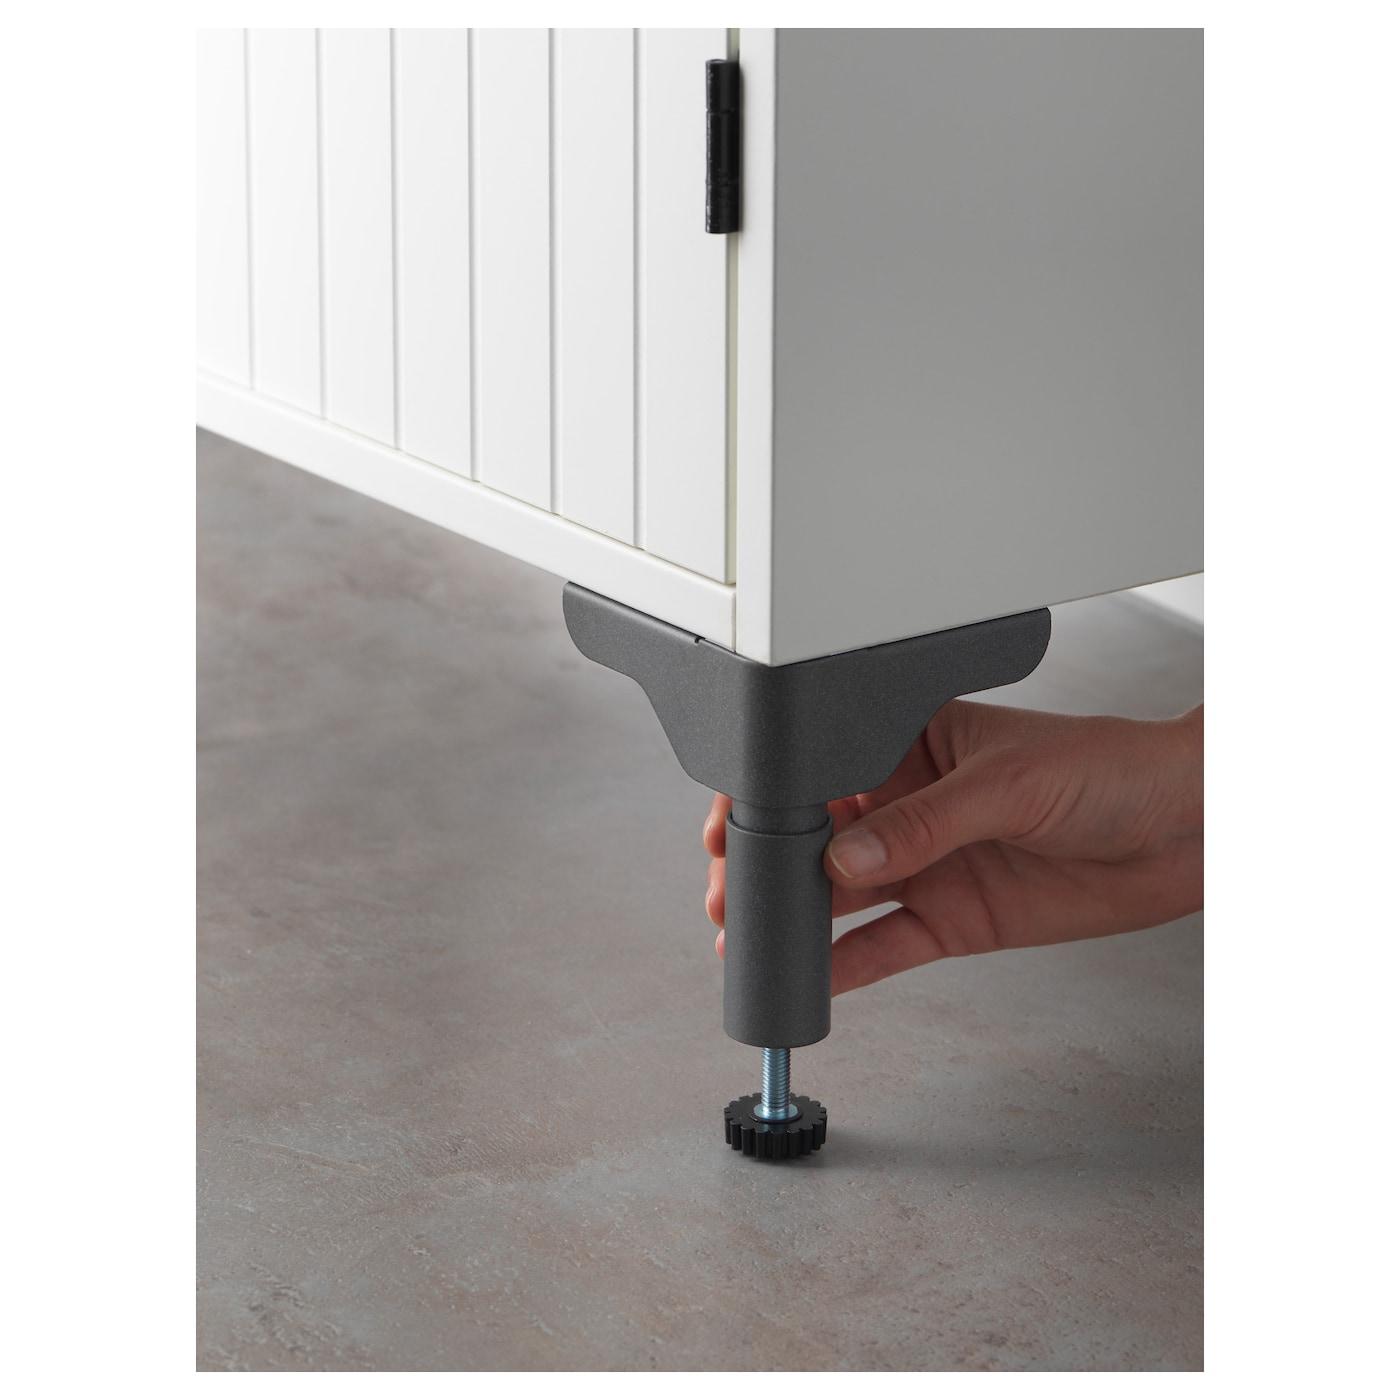 IKEA SILVERÅN/HAMNVIKEN wash-basin cabinet with 1 door A good solution if you  sc 1 st  Ikea & SILVERÅN/HAMNVIKEN Wash-basin cabinet with 1 door White 40x45x91 ... pezcame.com